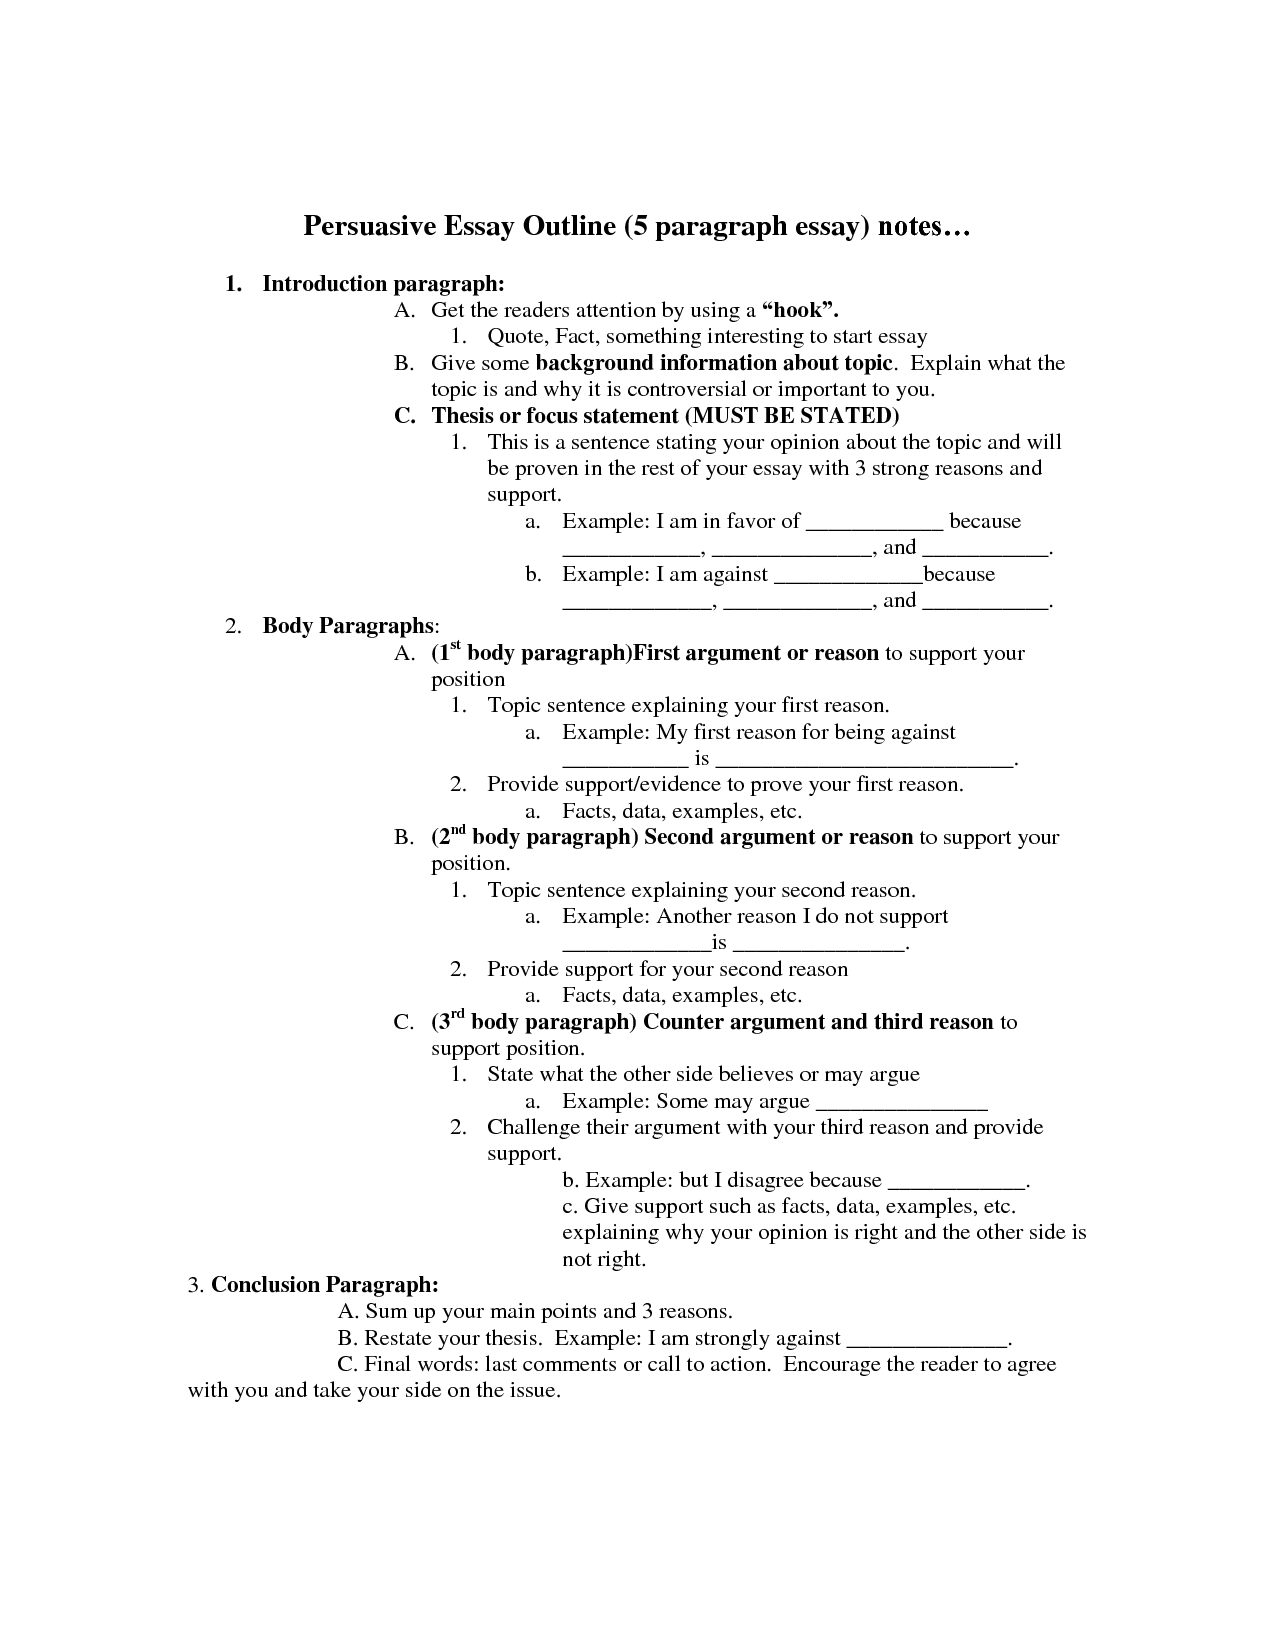 002 Essay Example Argument Outline Remarkable Sample 5 Paragraph Argumentative Template Blank Full